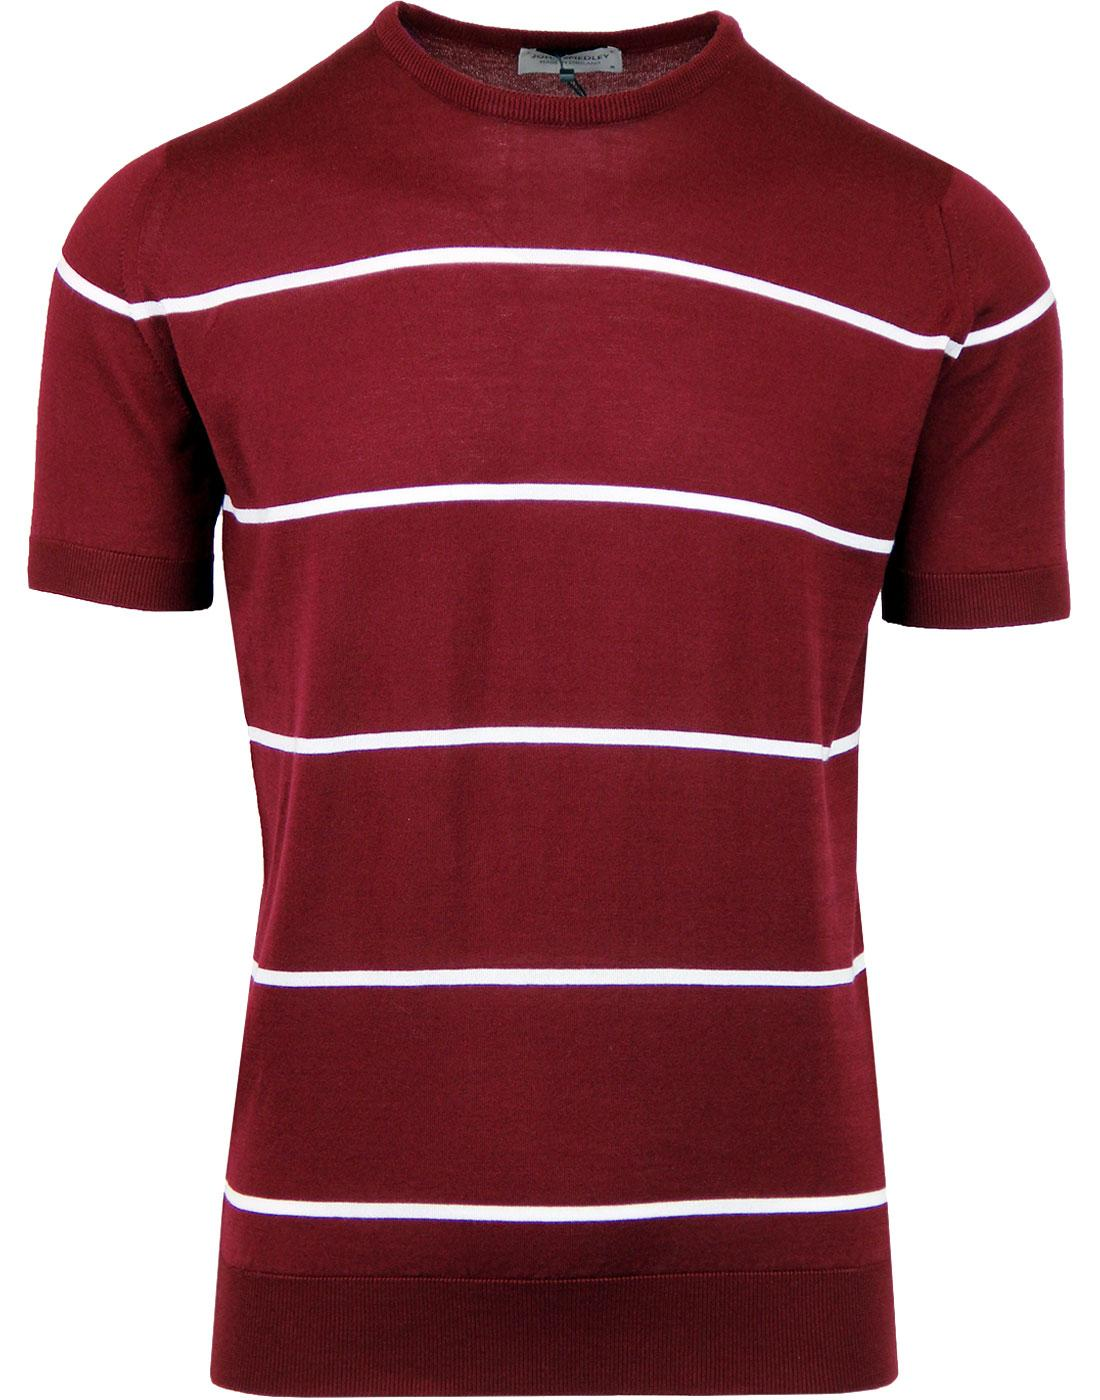 Barlby JOHN SMEDLEY  Mod Striped Knitted T-shirt